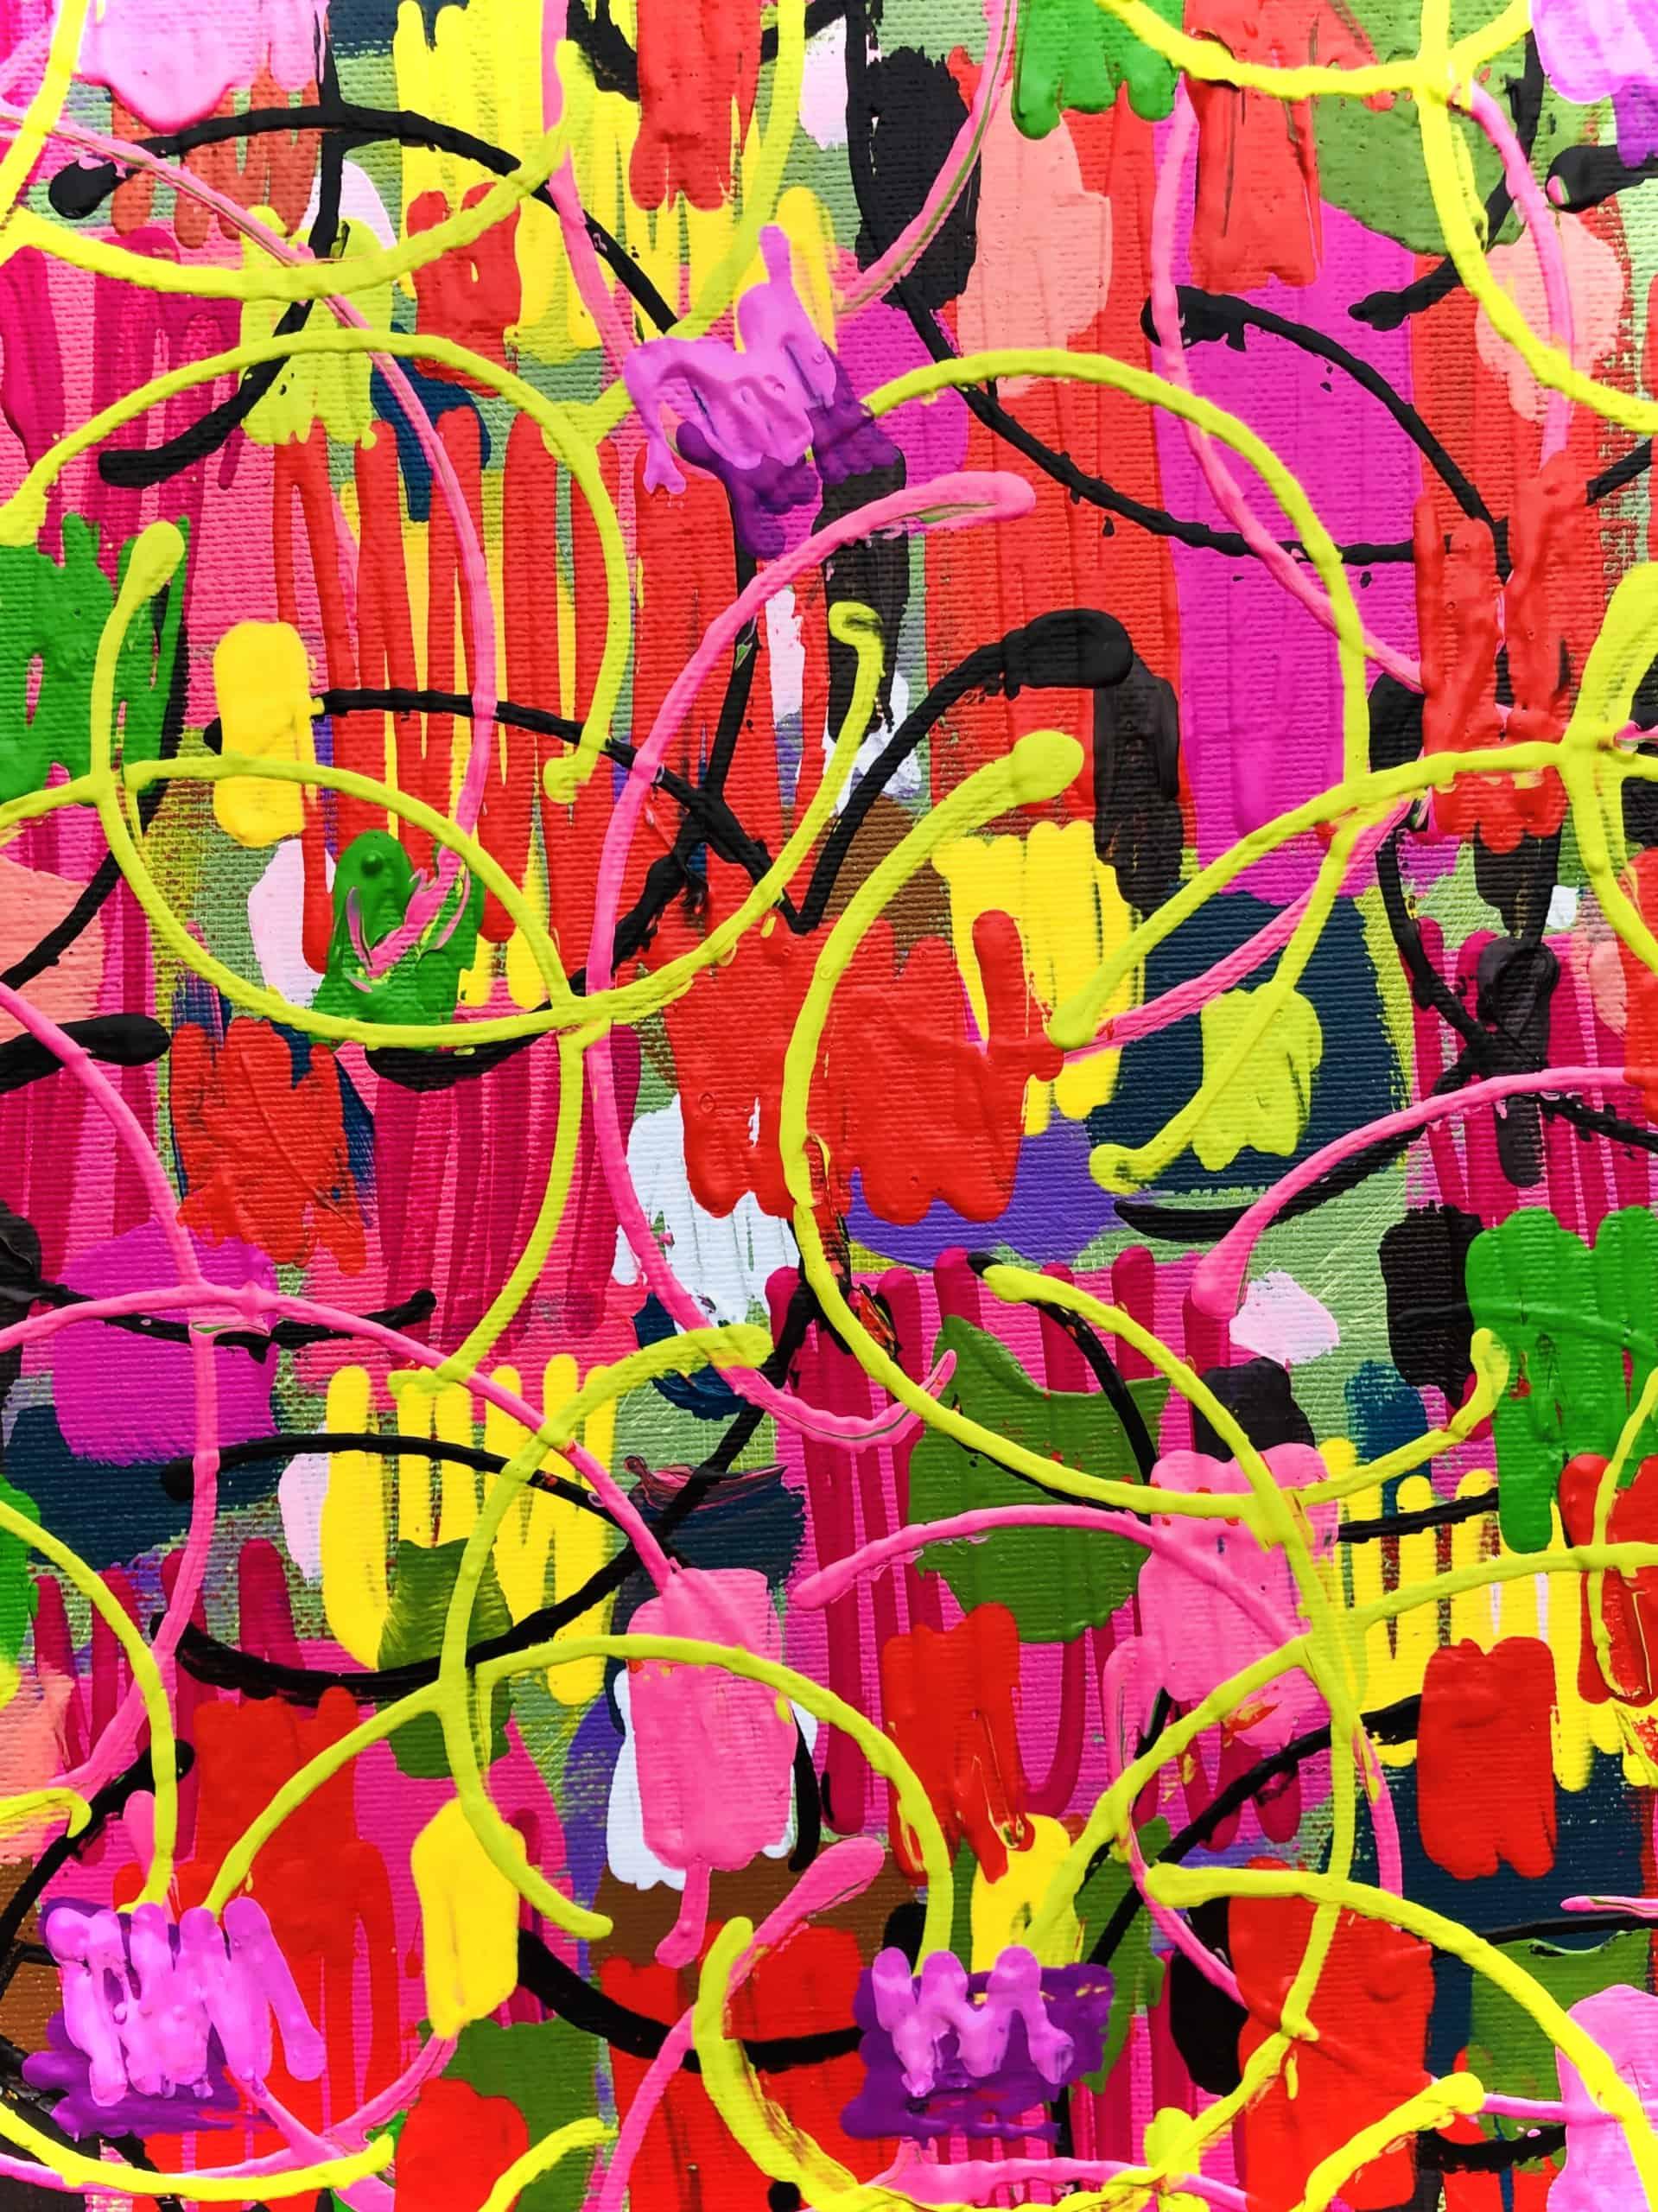 f7-3_nature-12_200x200_detail-2